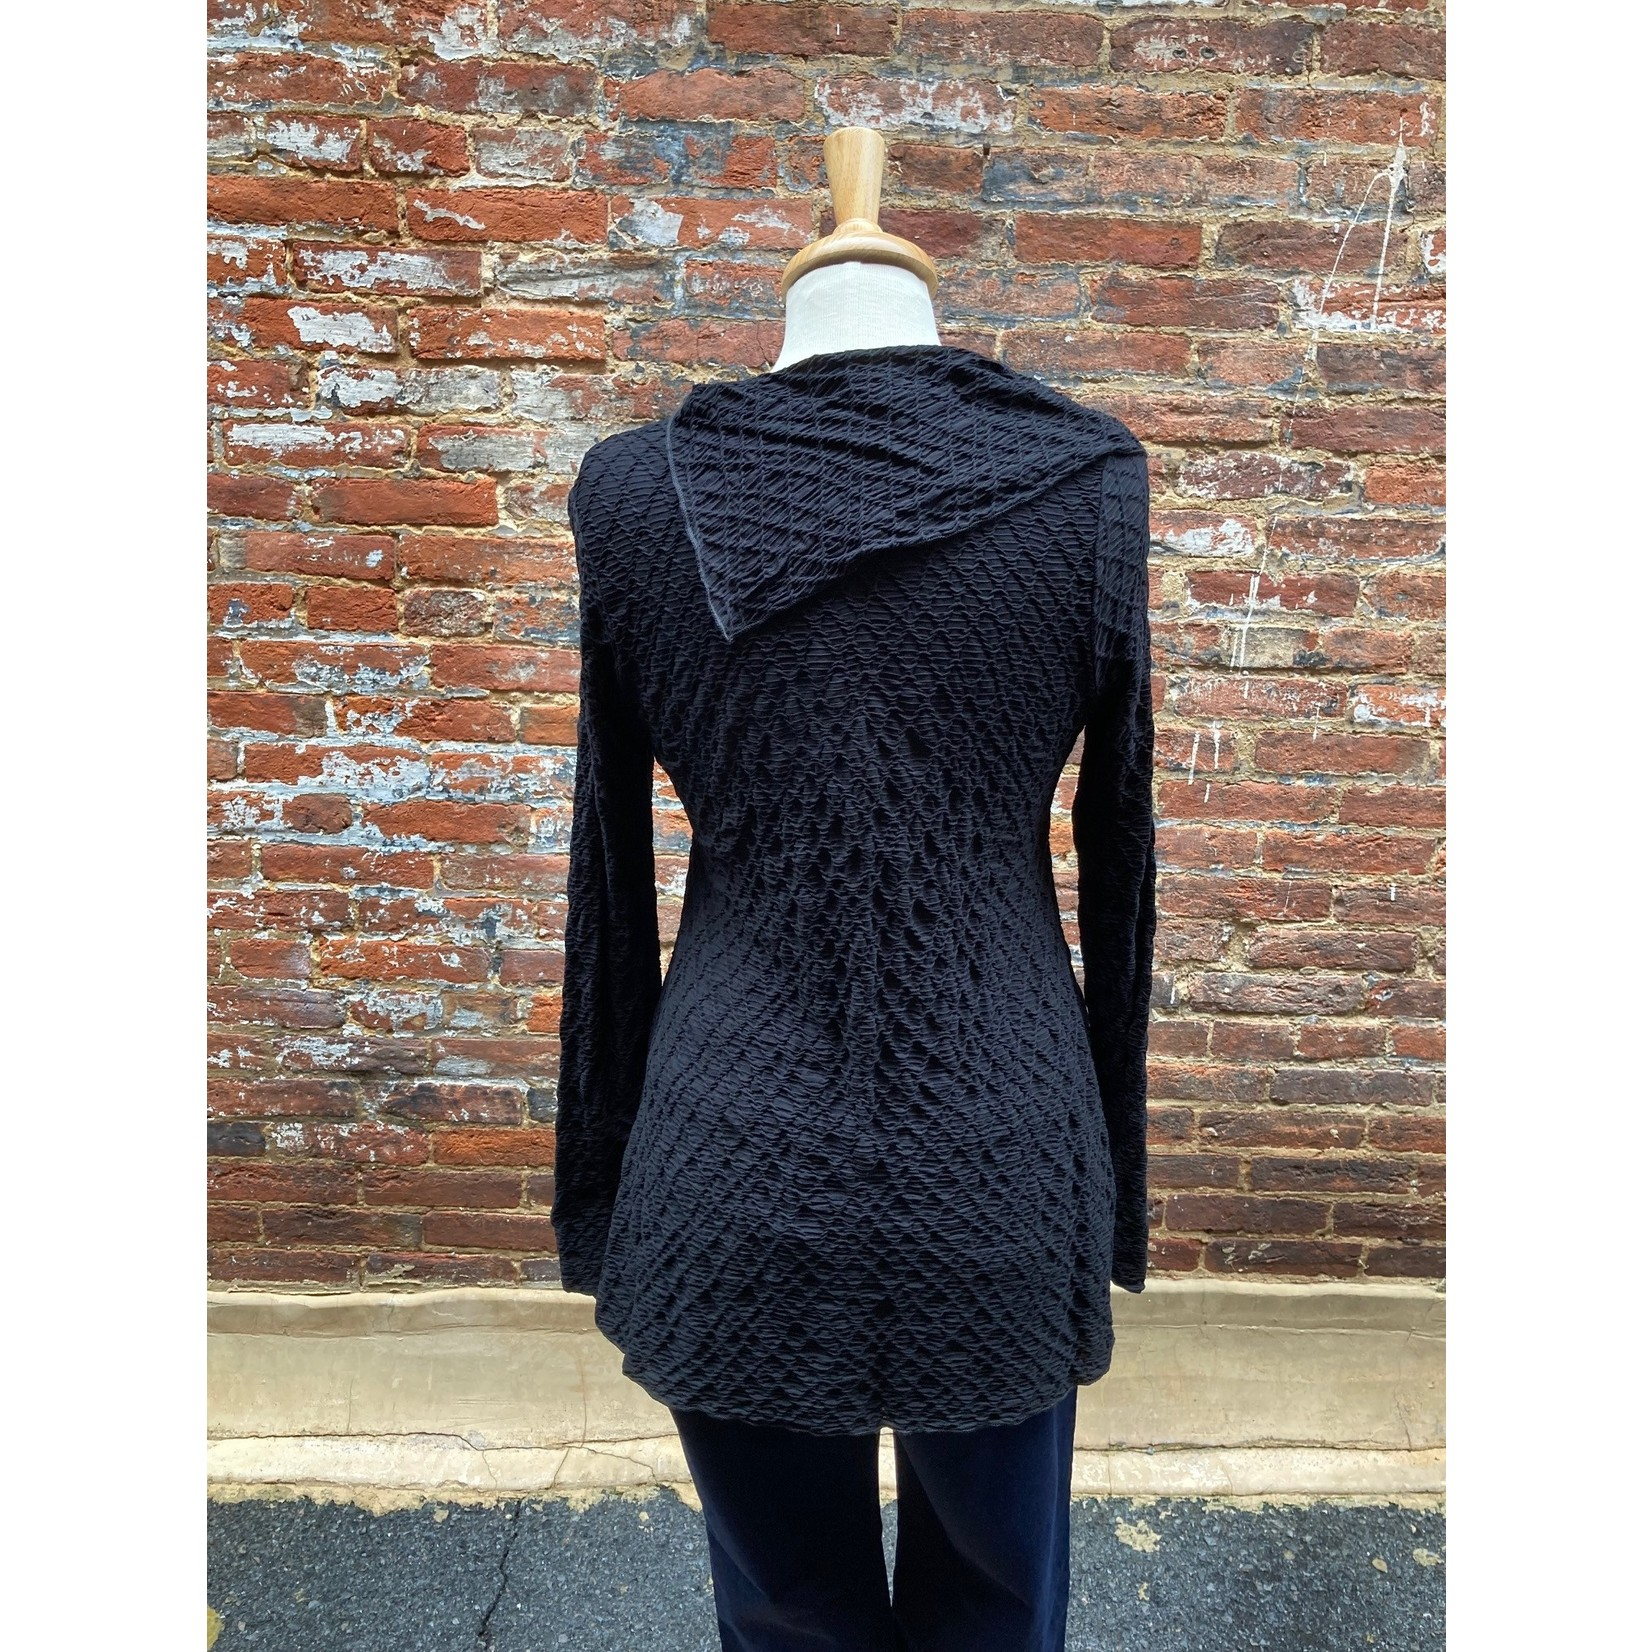 Sno Skin Dreamweaver Asymetrical Collar Top in Black